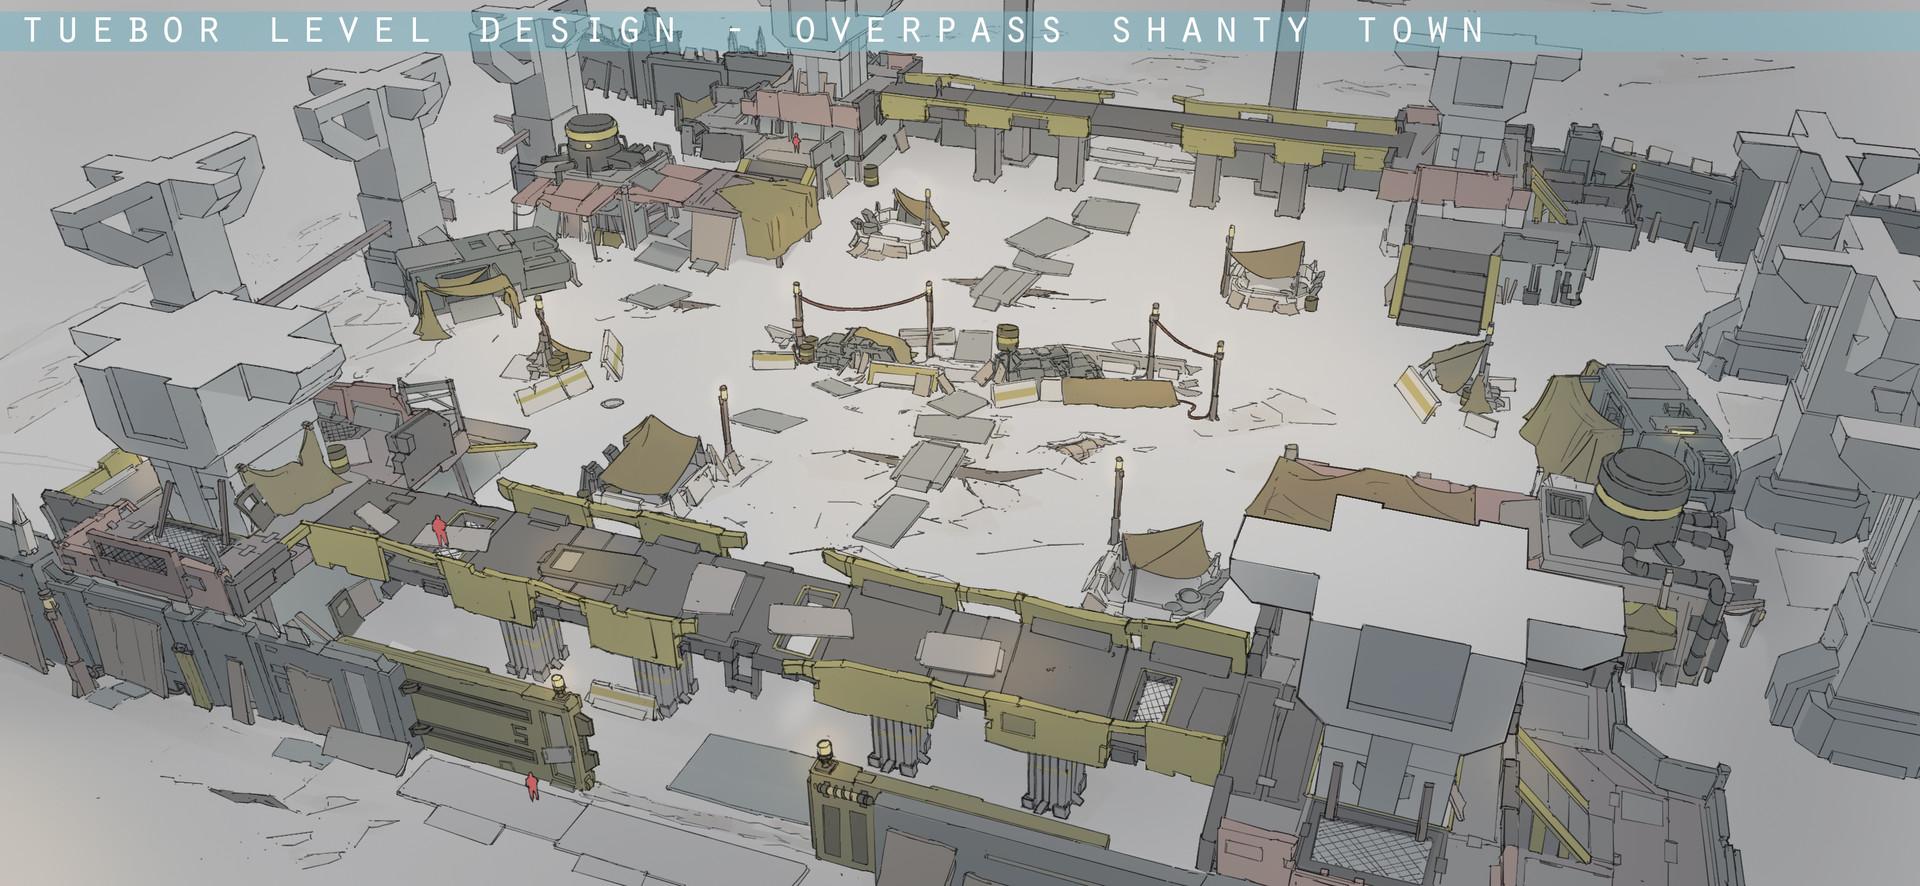 Franklin chan overpass level design 02